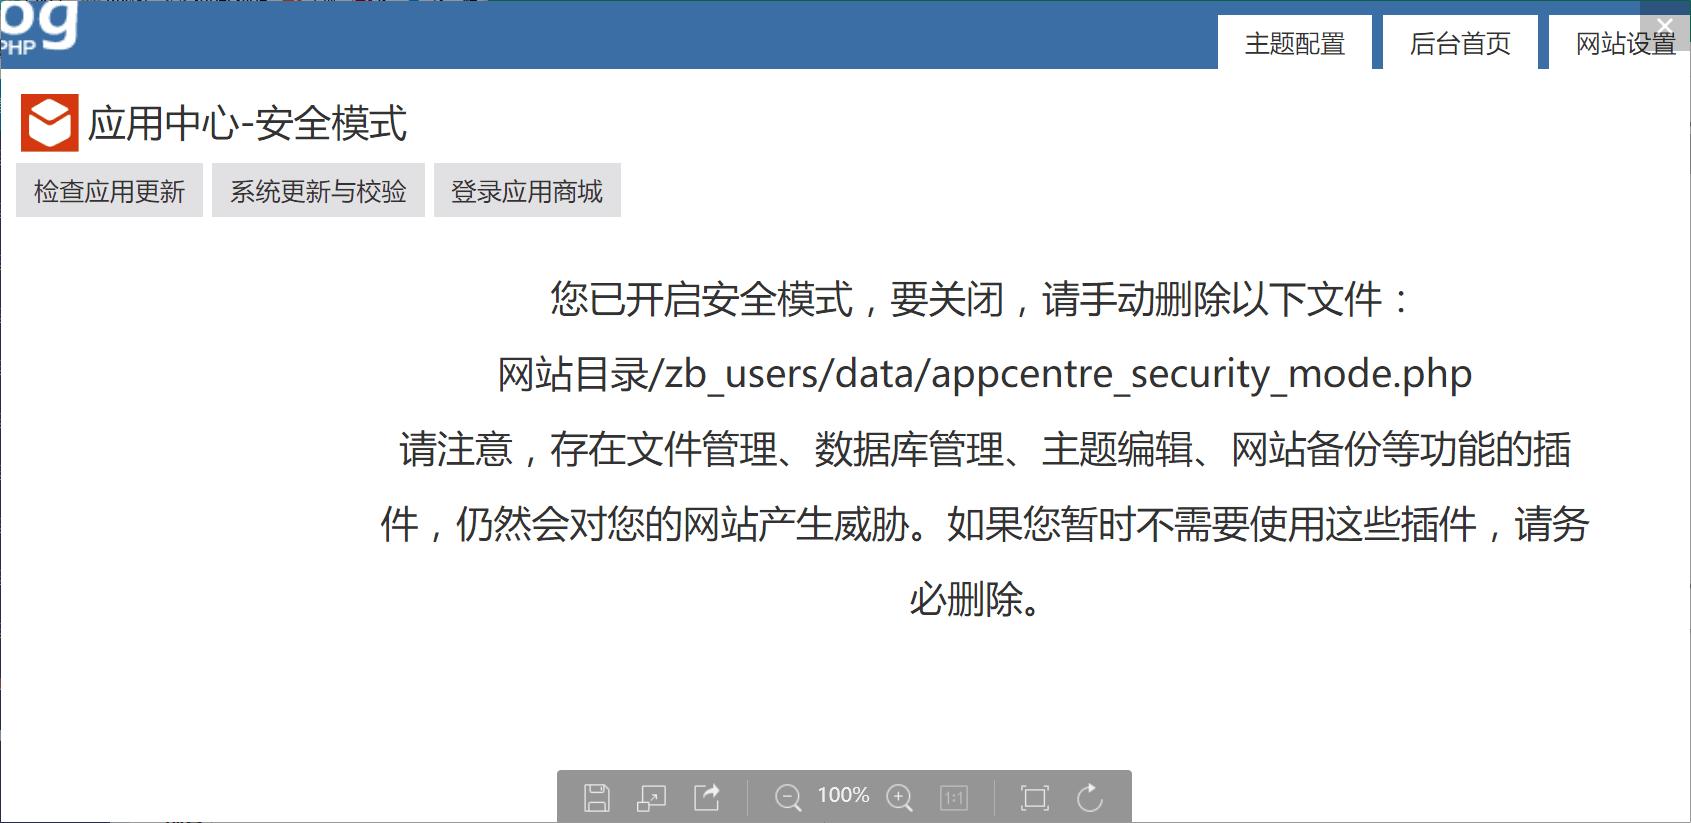 "201903171552828907918859.png zblog如何防止被黑和安全模式怎么设置 zblog最新版是自带""安全配置"" zblog防黑 zblog 第3张"